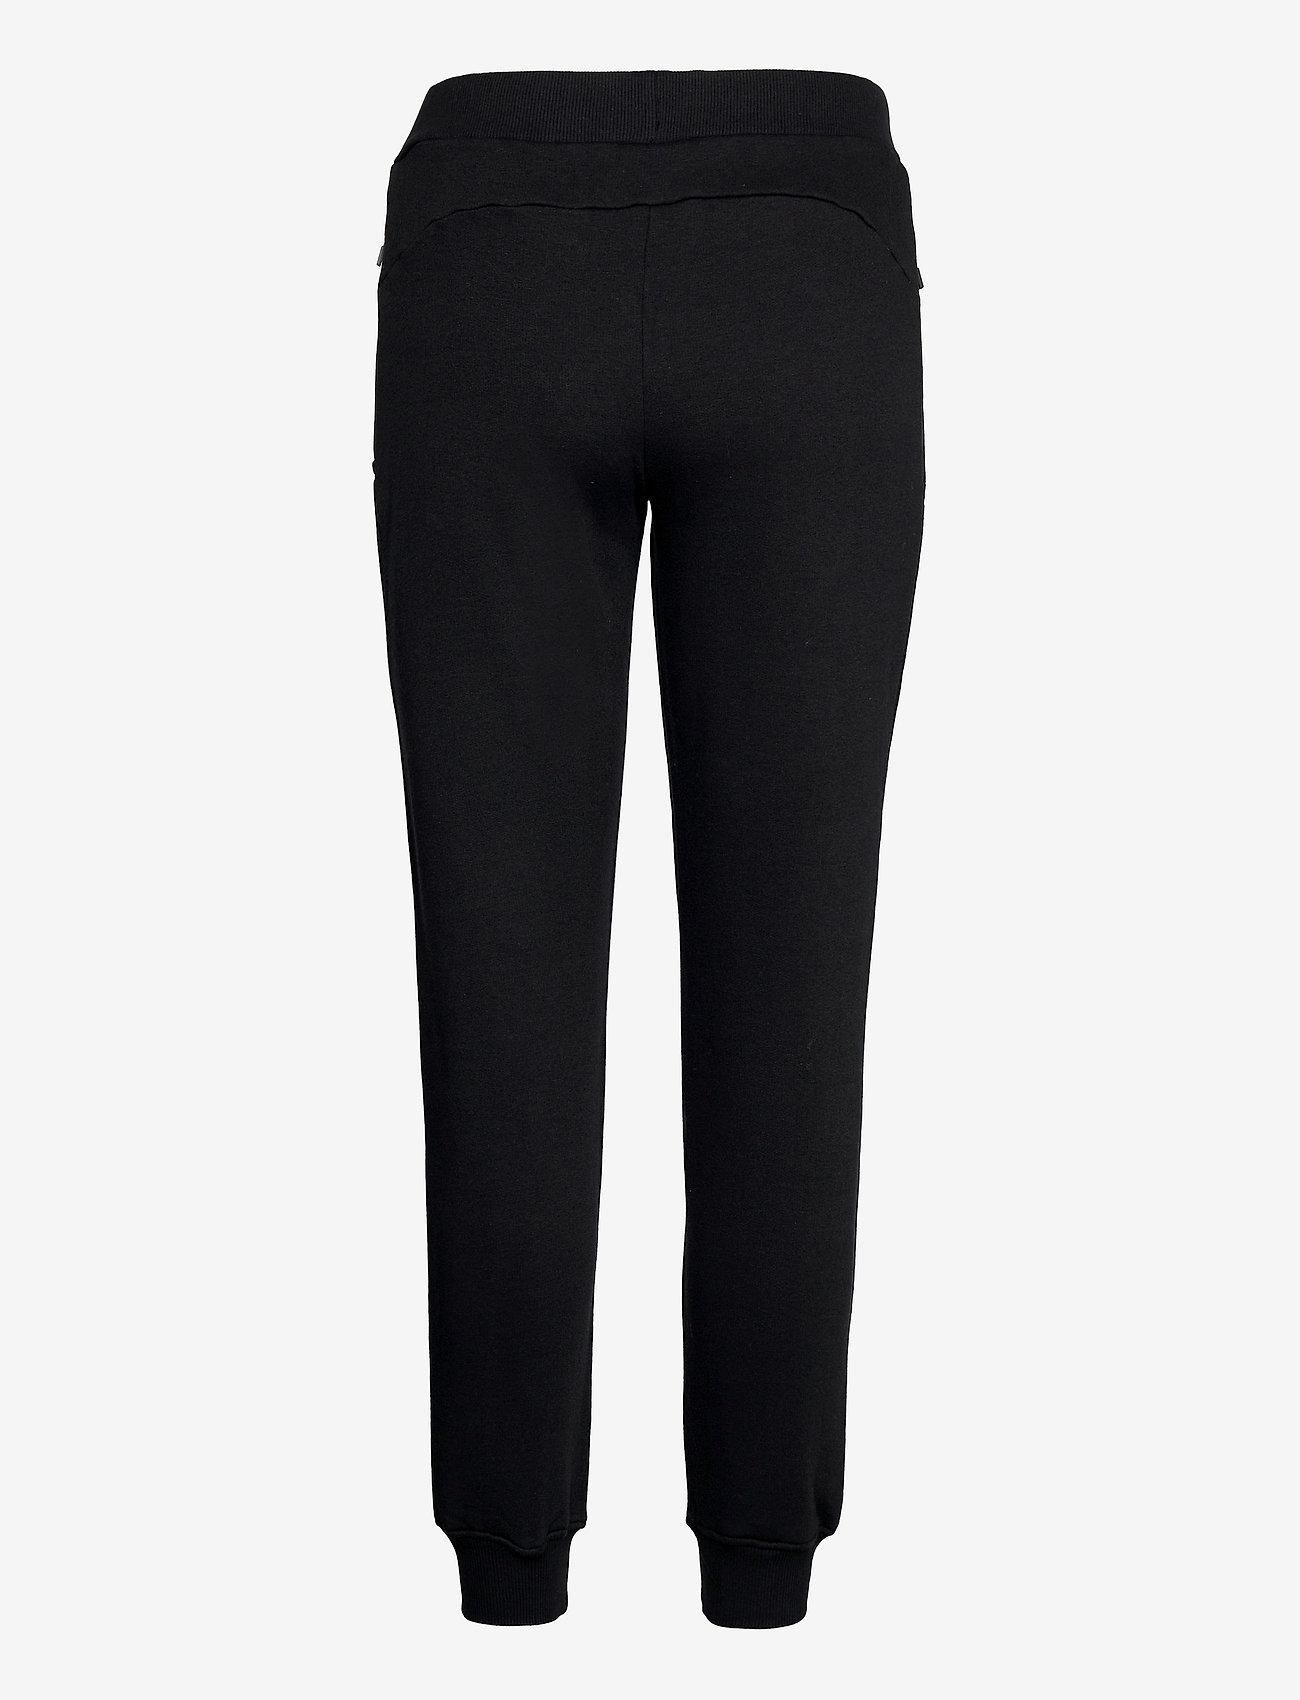 Ellesse - EL AFRILE JOGPANT - pants - black - 1